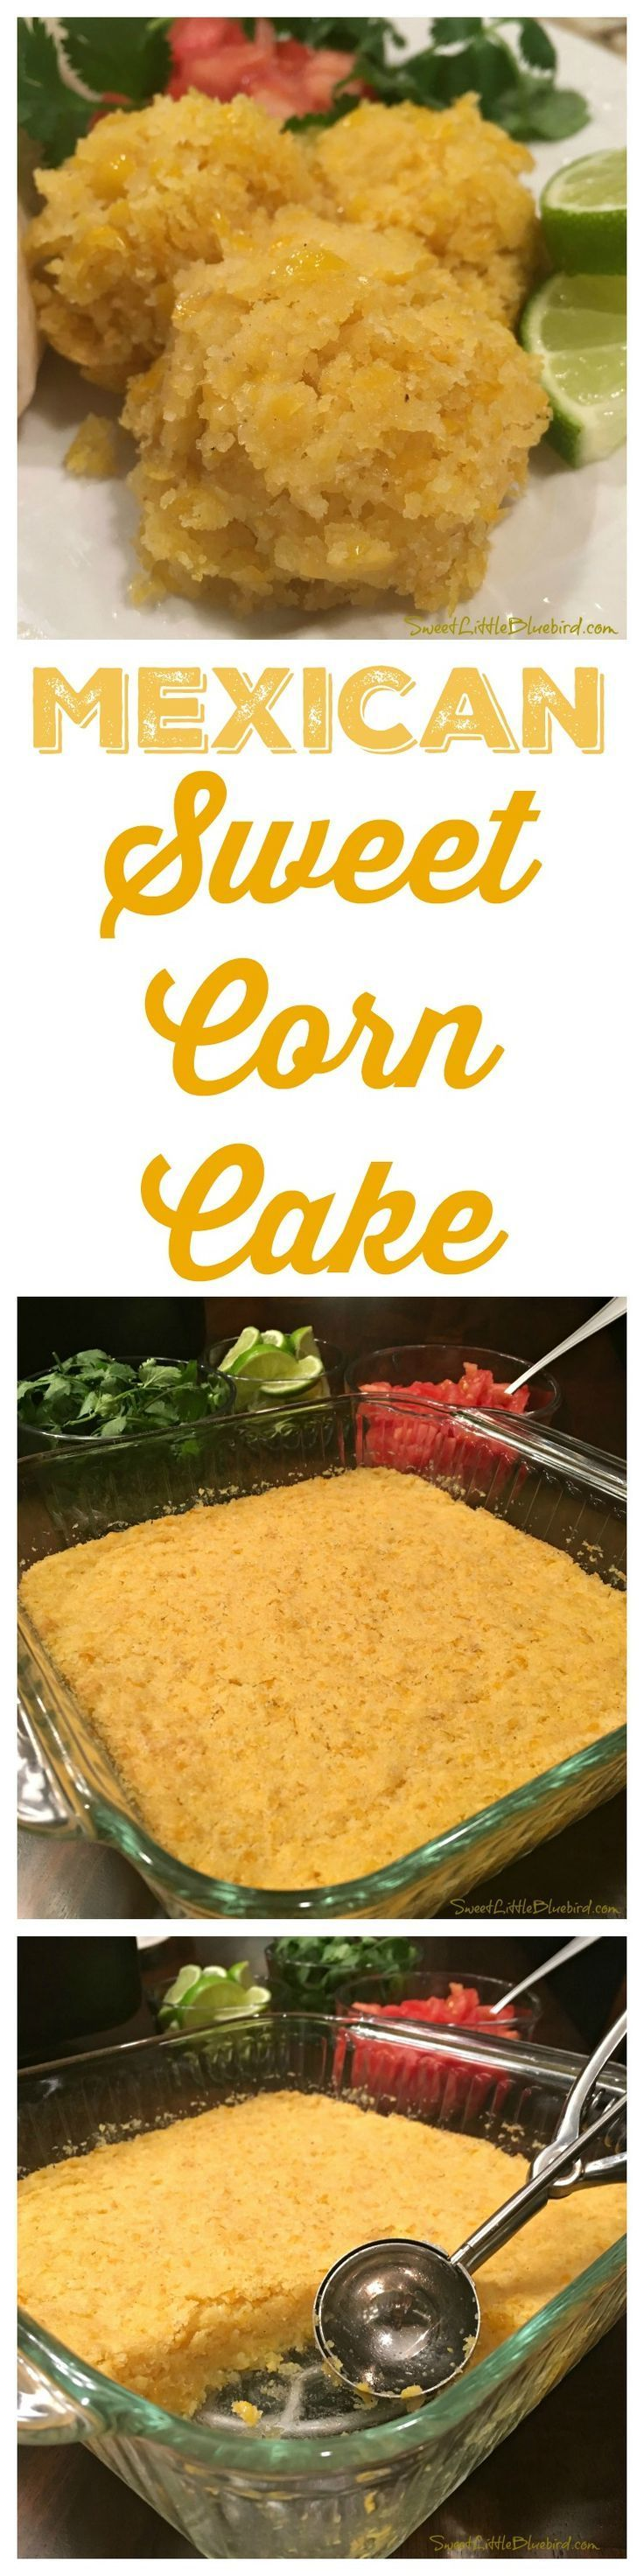 MEXICAN SWEET CORN CAKE -  The perfect side dish for any Mexican meal, Sweet Corn Cake! Just like the sweet corn side dish served at your favorite Mexican restaurants like Chi Chi's, Chevys Fresh Mex & El Torito! |  SweetLittleBluebi...